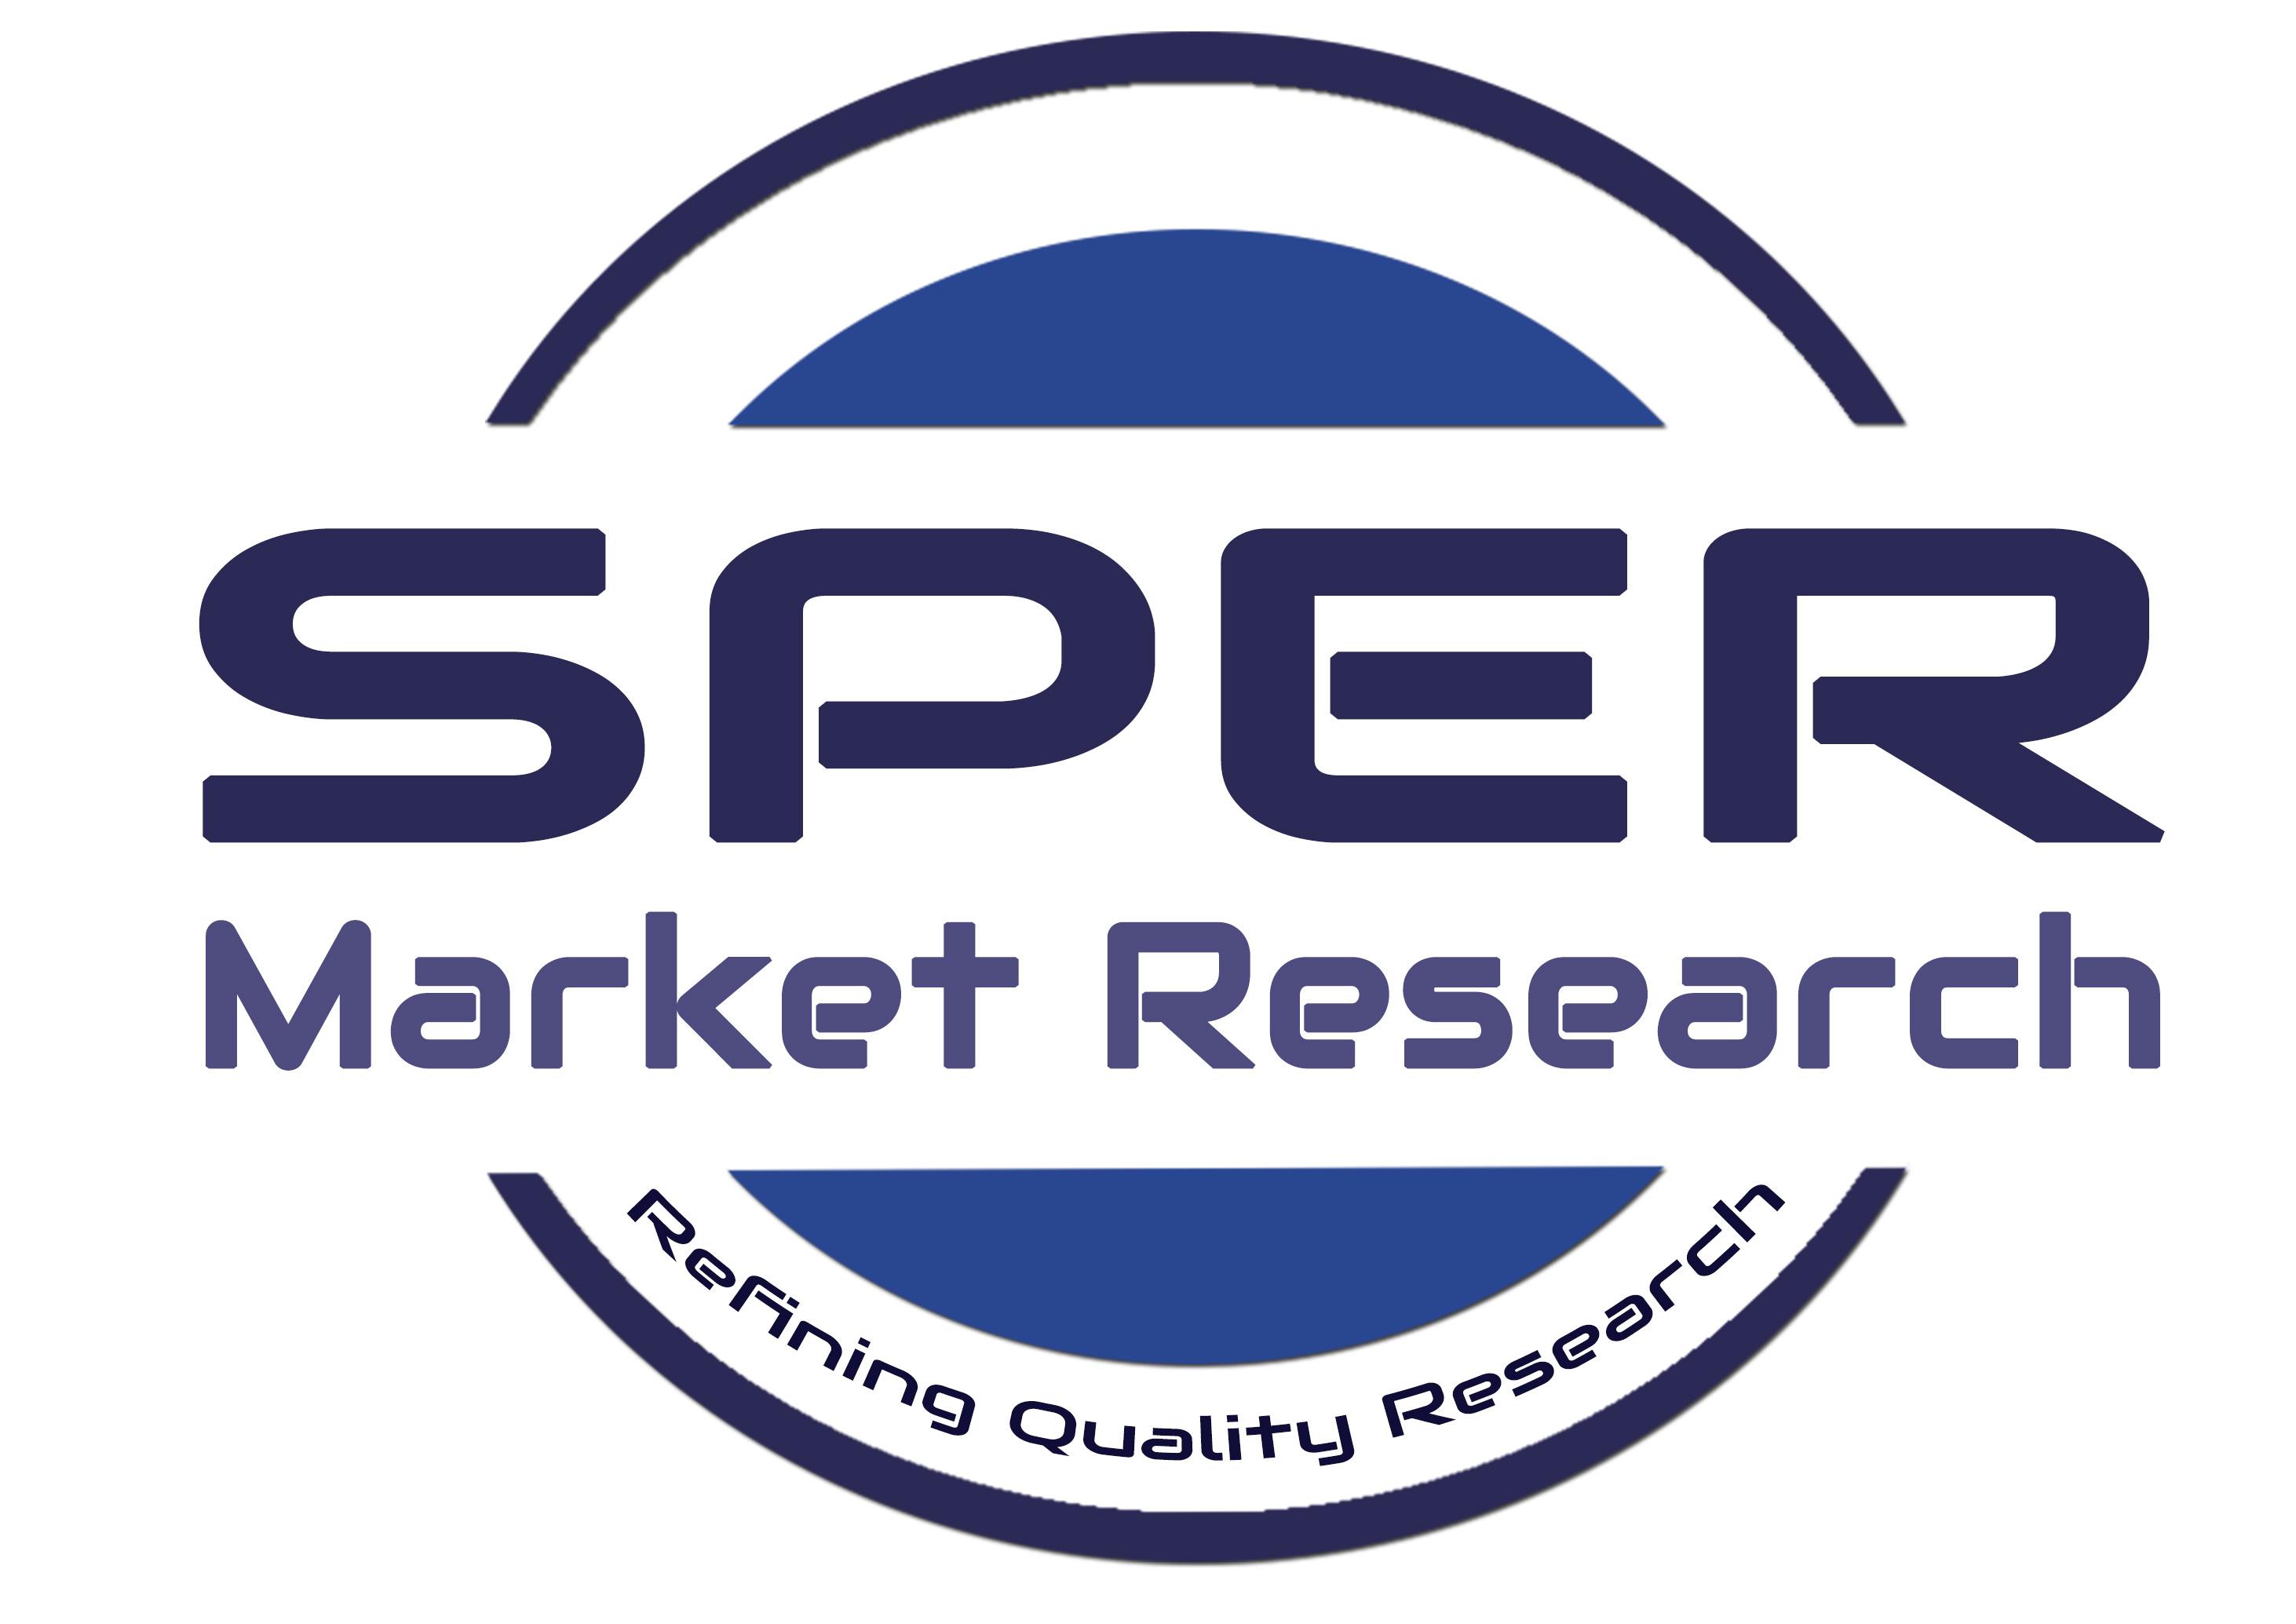 SPER Market Research Pvt. Ltd. Logo